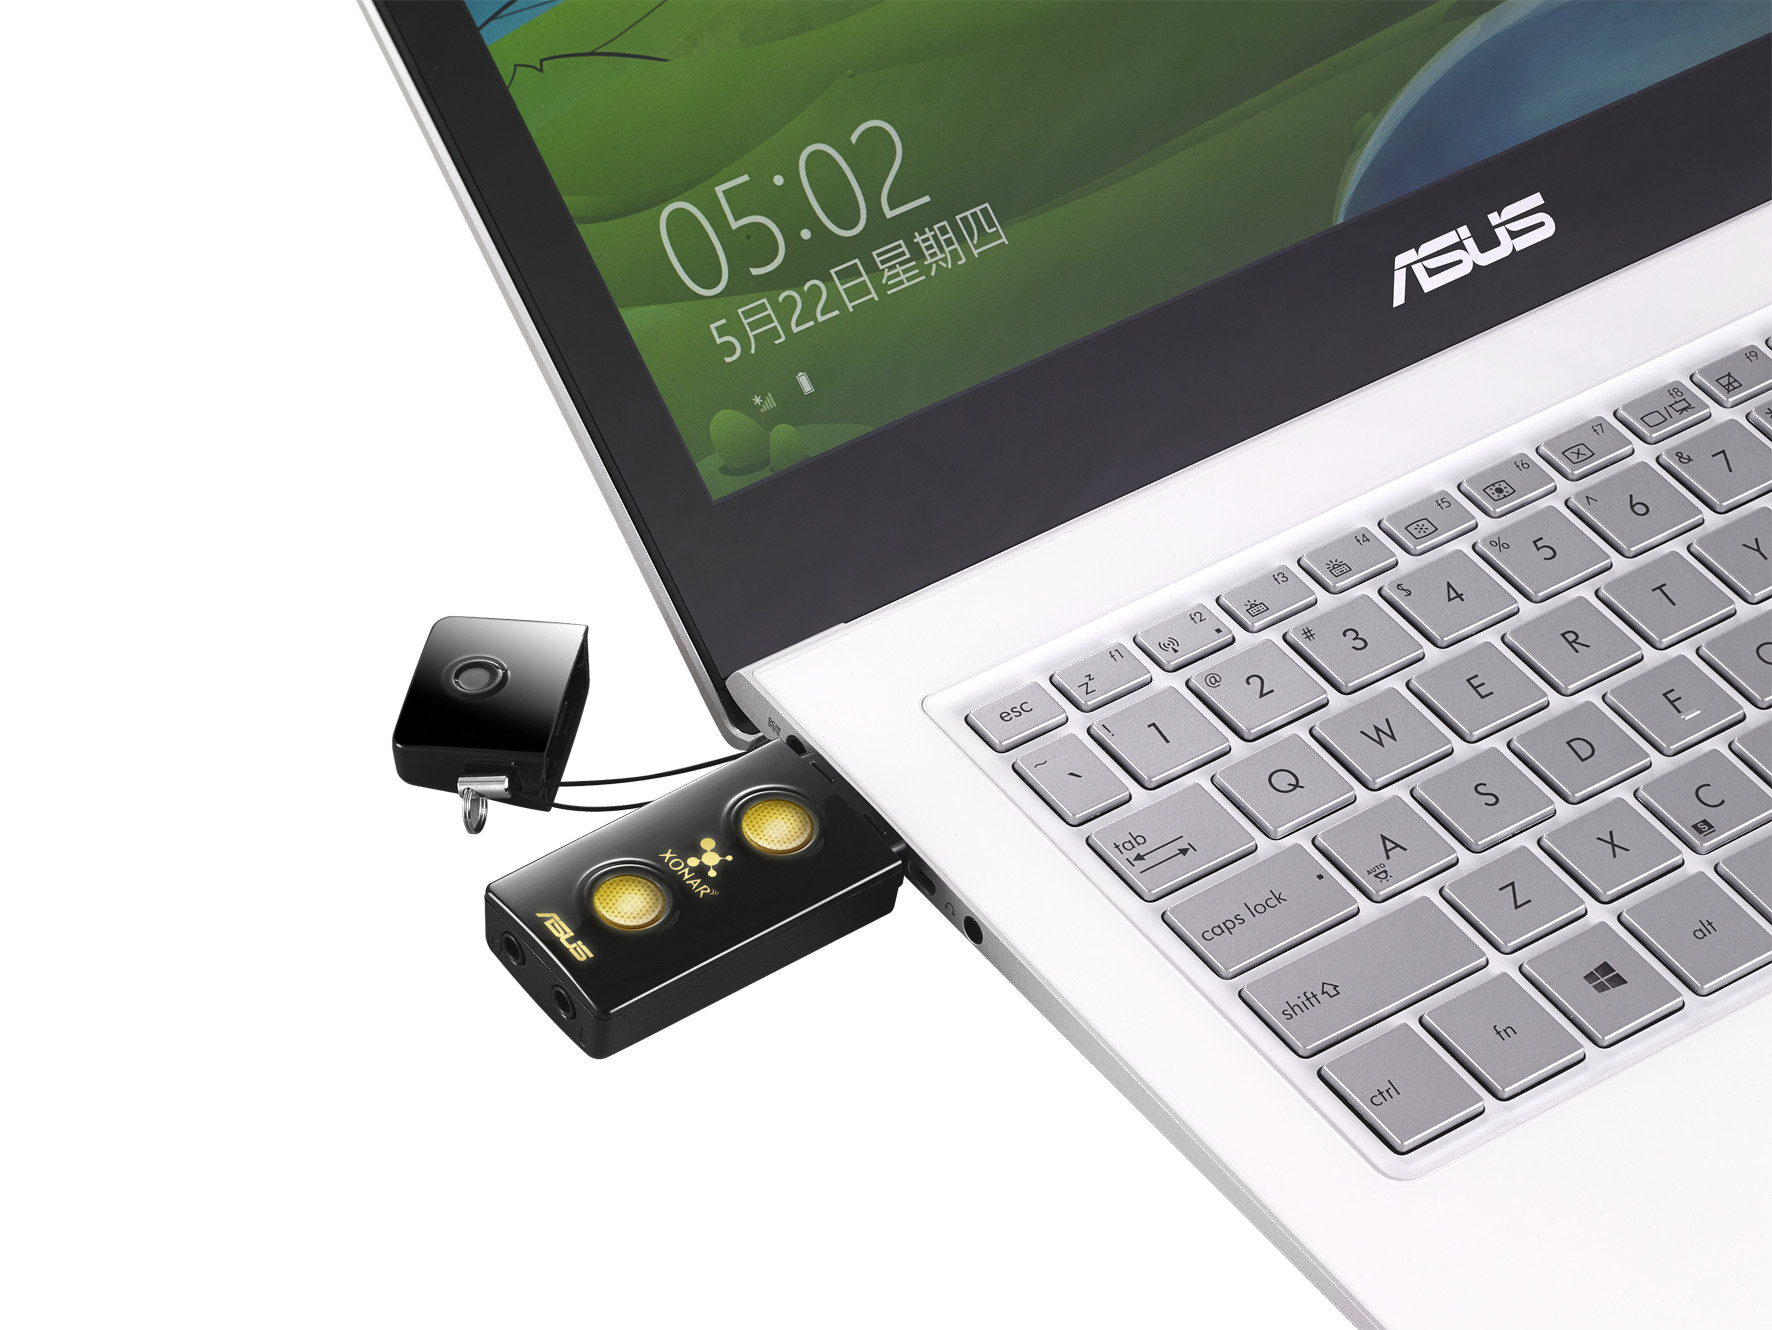 Asus Announces Xonar U3 Plus External Dac With Headphones Amp Earphone Headset Stereo Oem